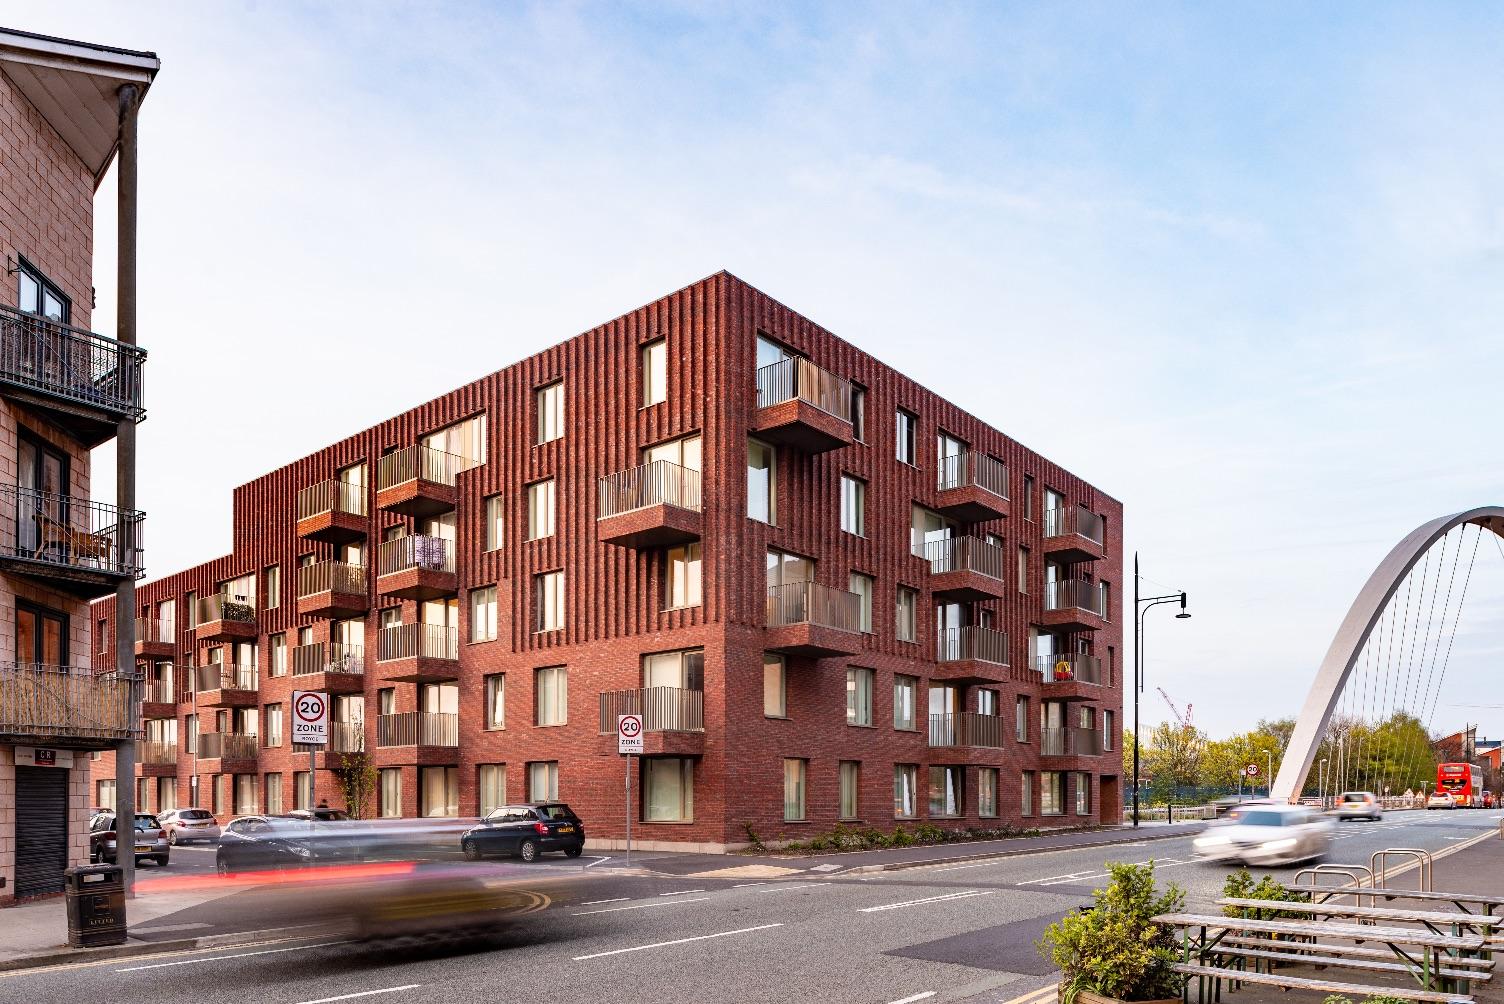 10_mecanoo_Hulme Living Leaf Street Housing_Inspirationist